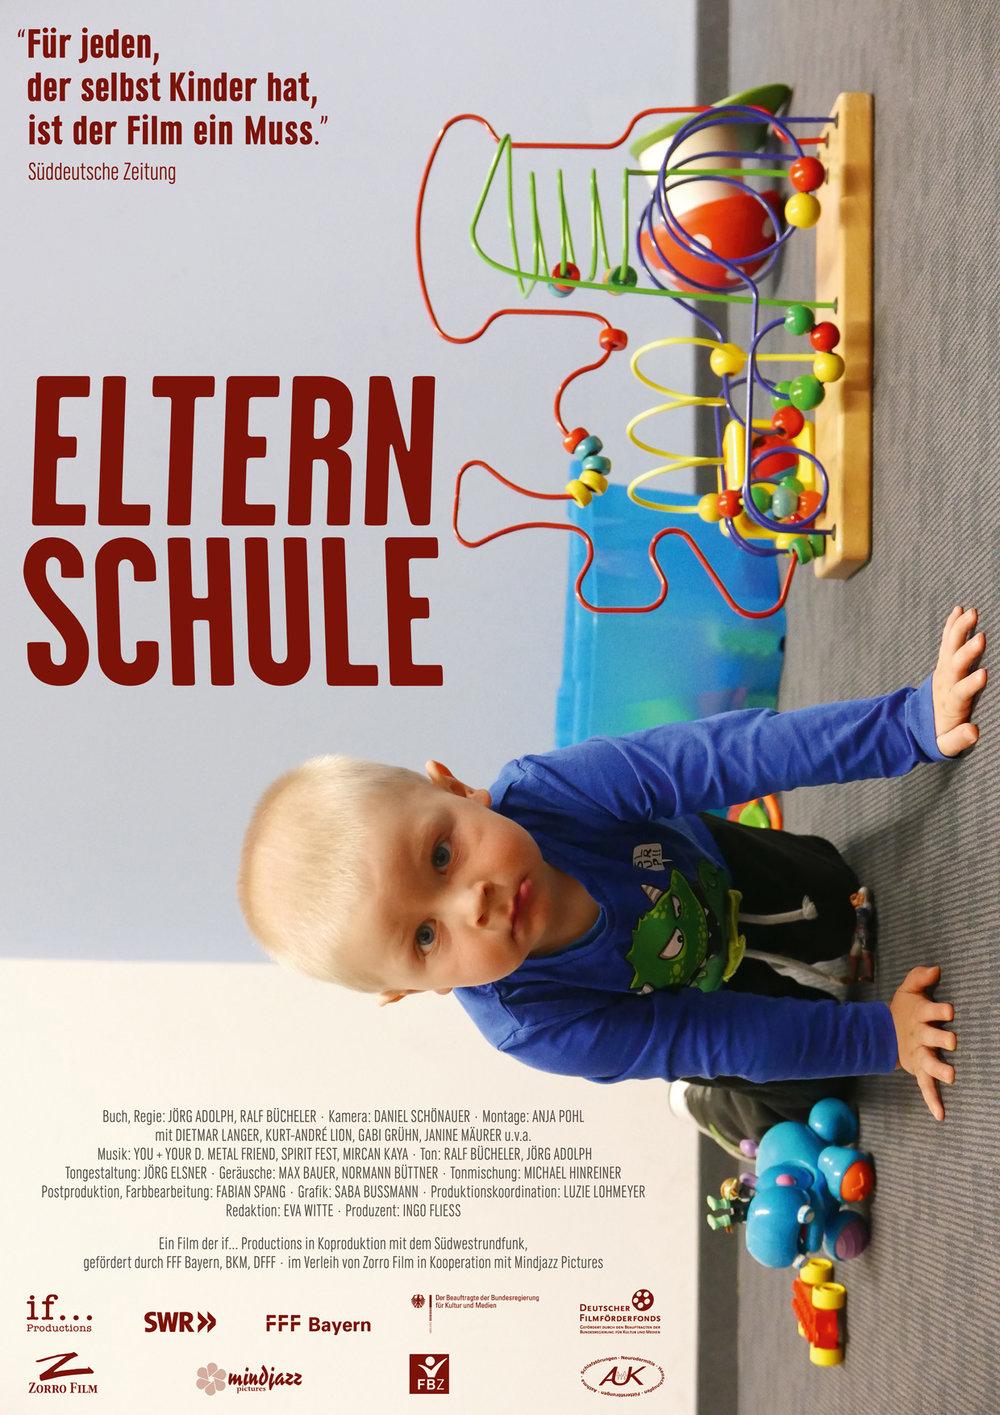 Elternschule_Plakat_A4_150dpi, if... productions.jpg